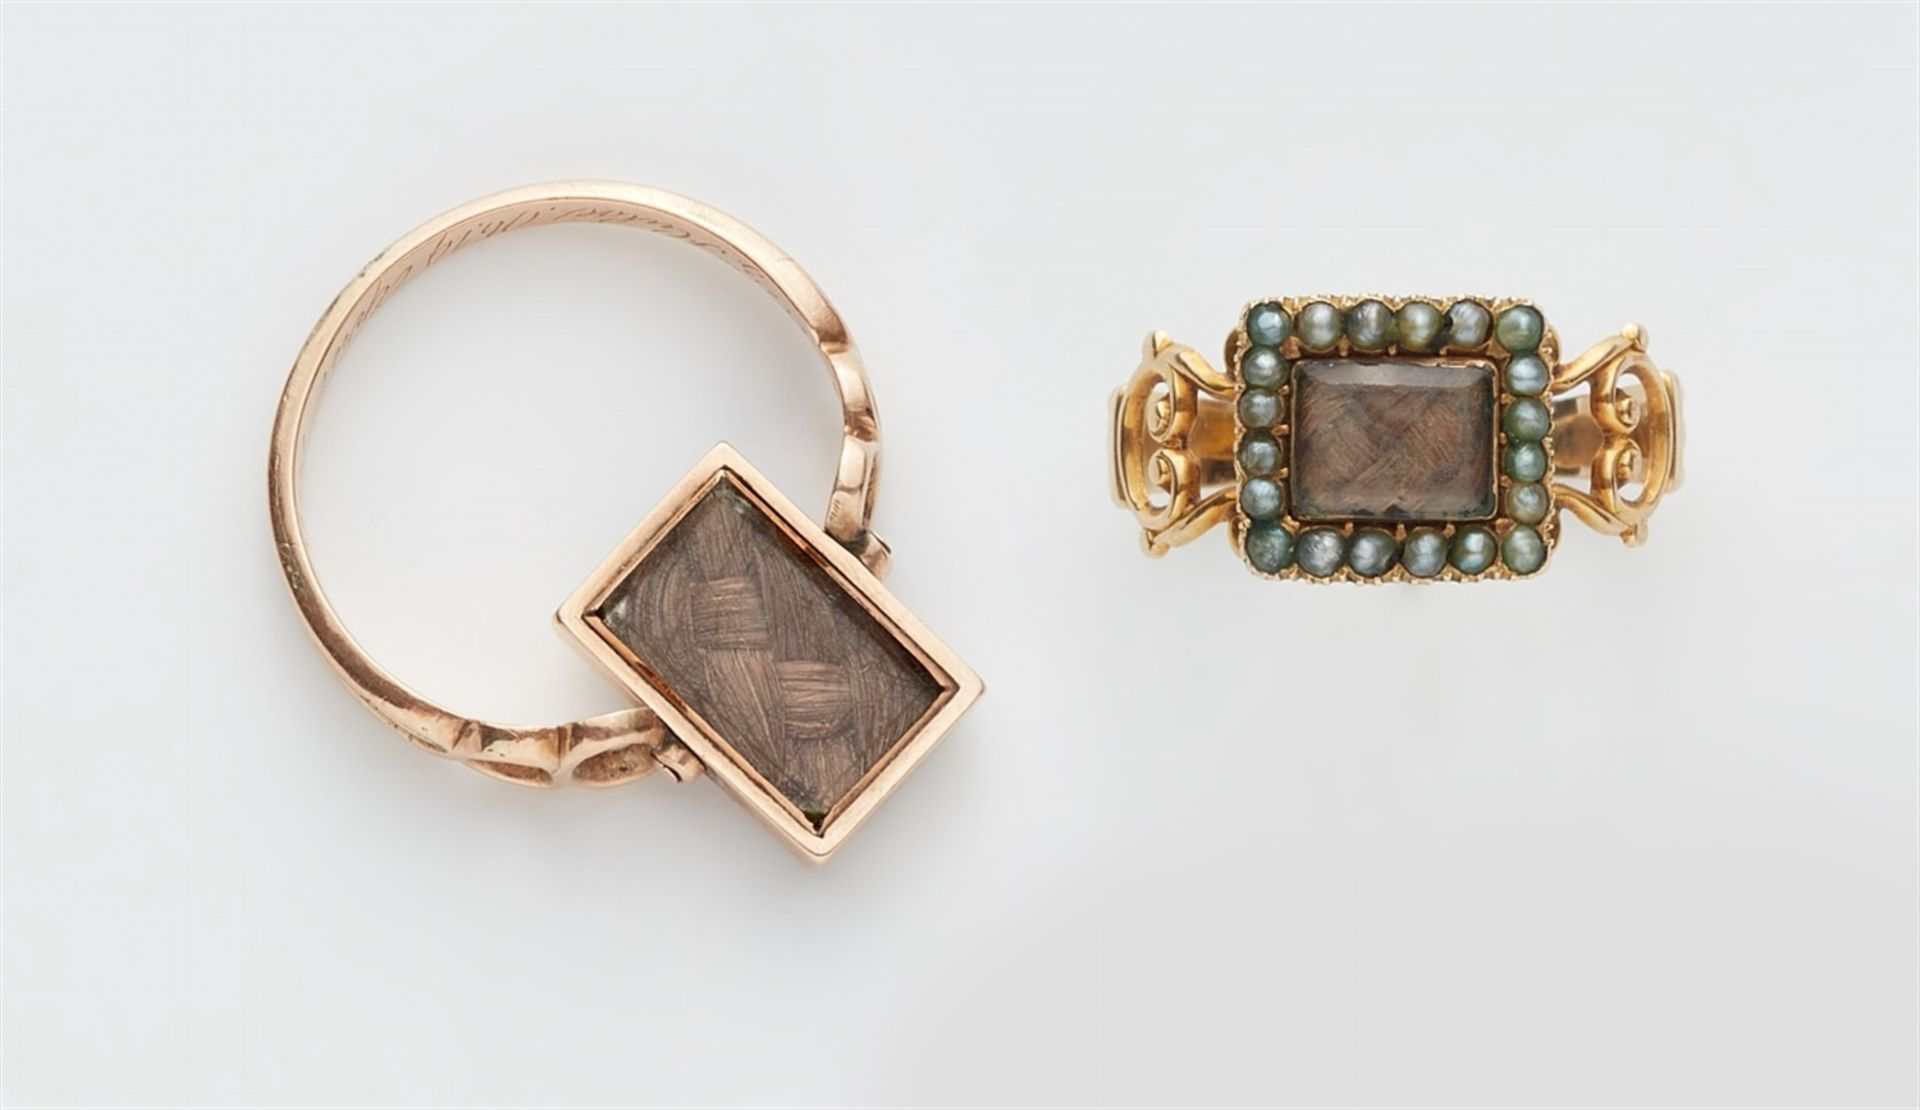 Zwei George III-Mourning-Ringe